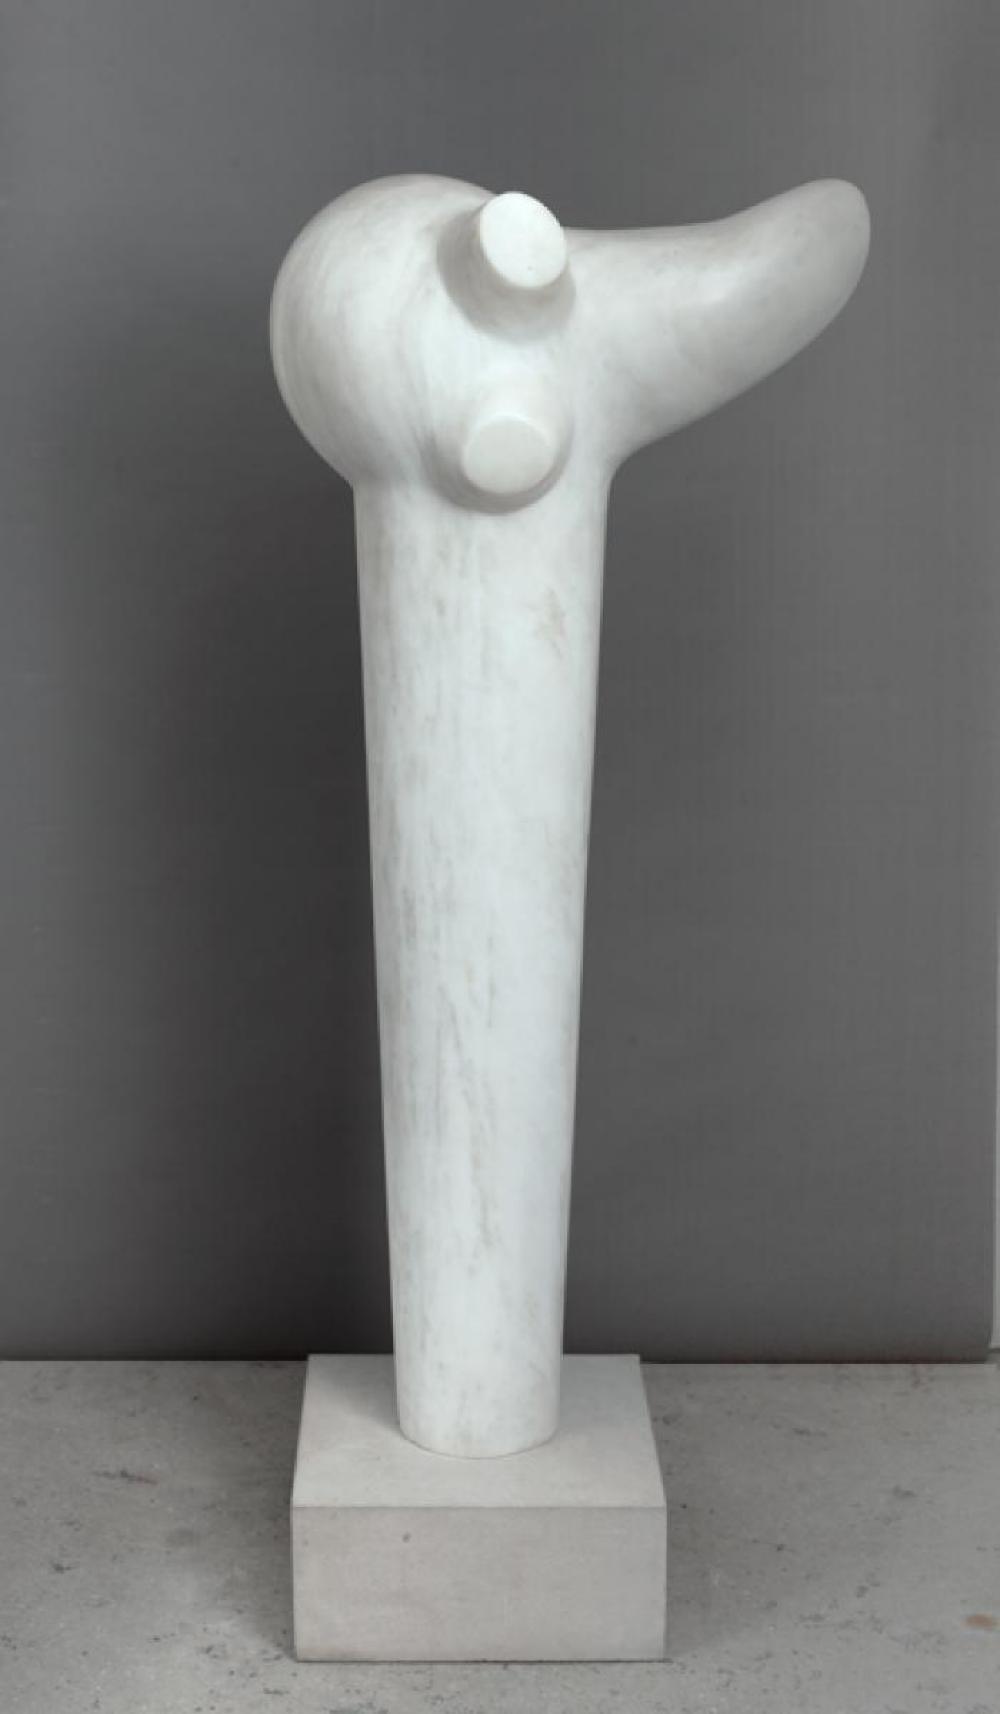 Bird B, image 1